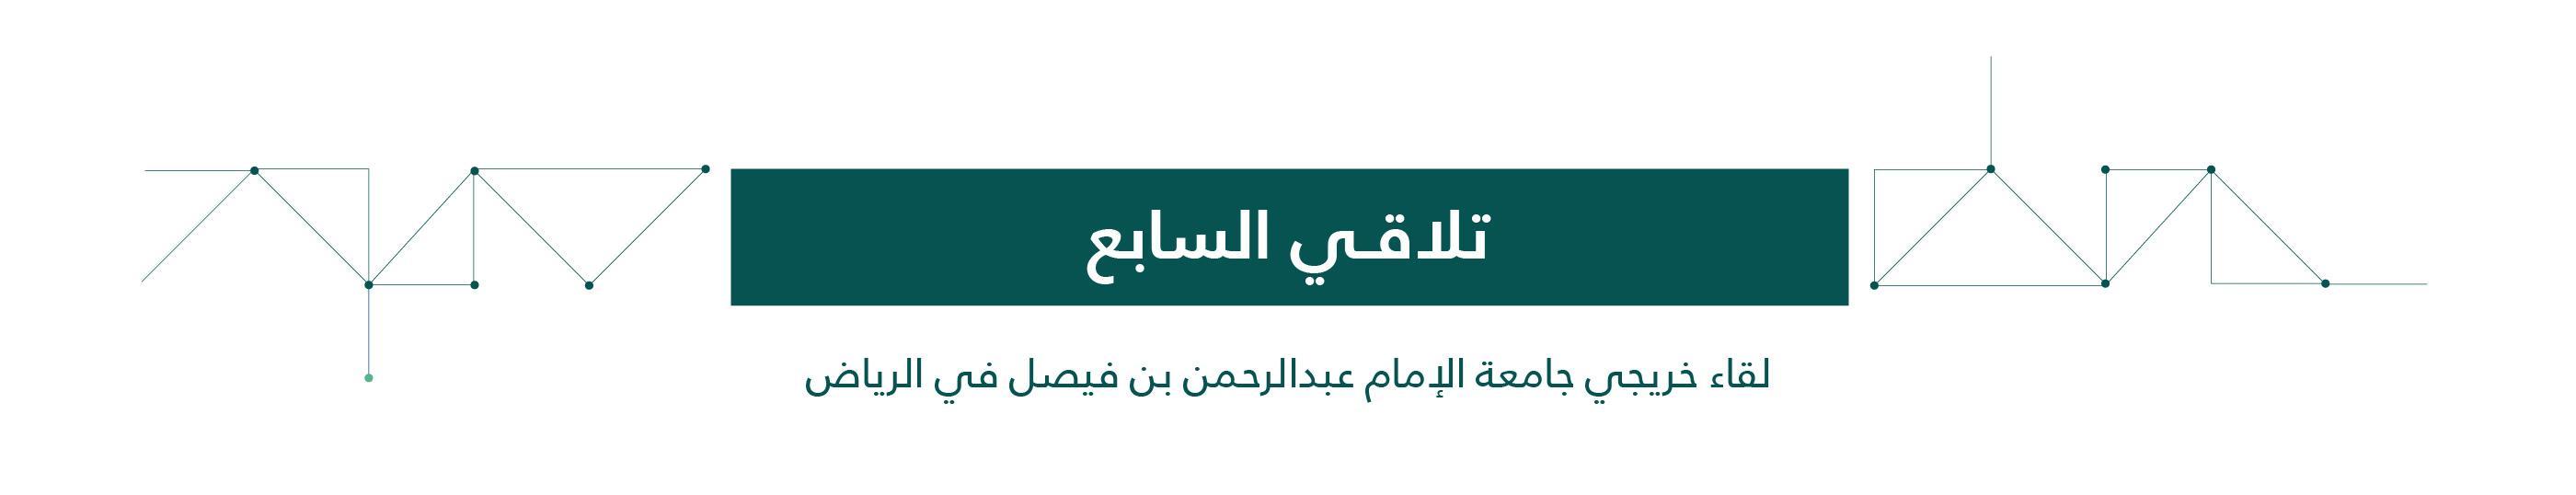 Talaqi 7 (Riyadh)